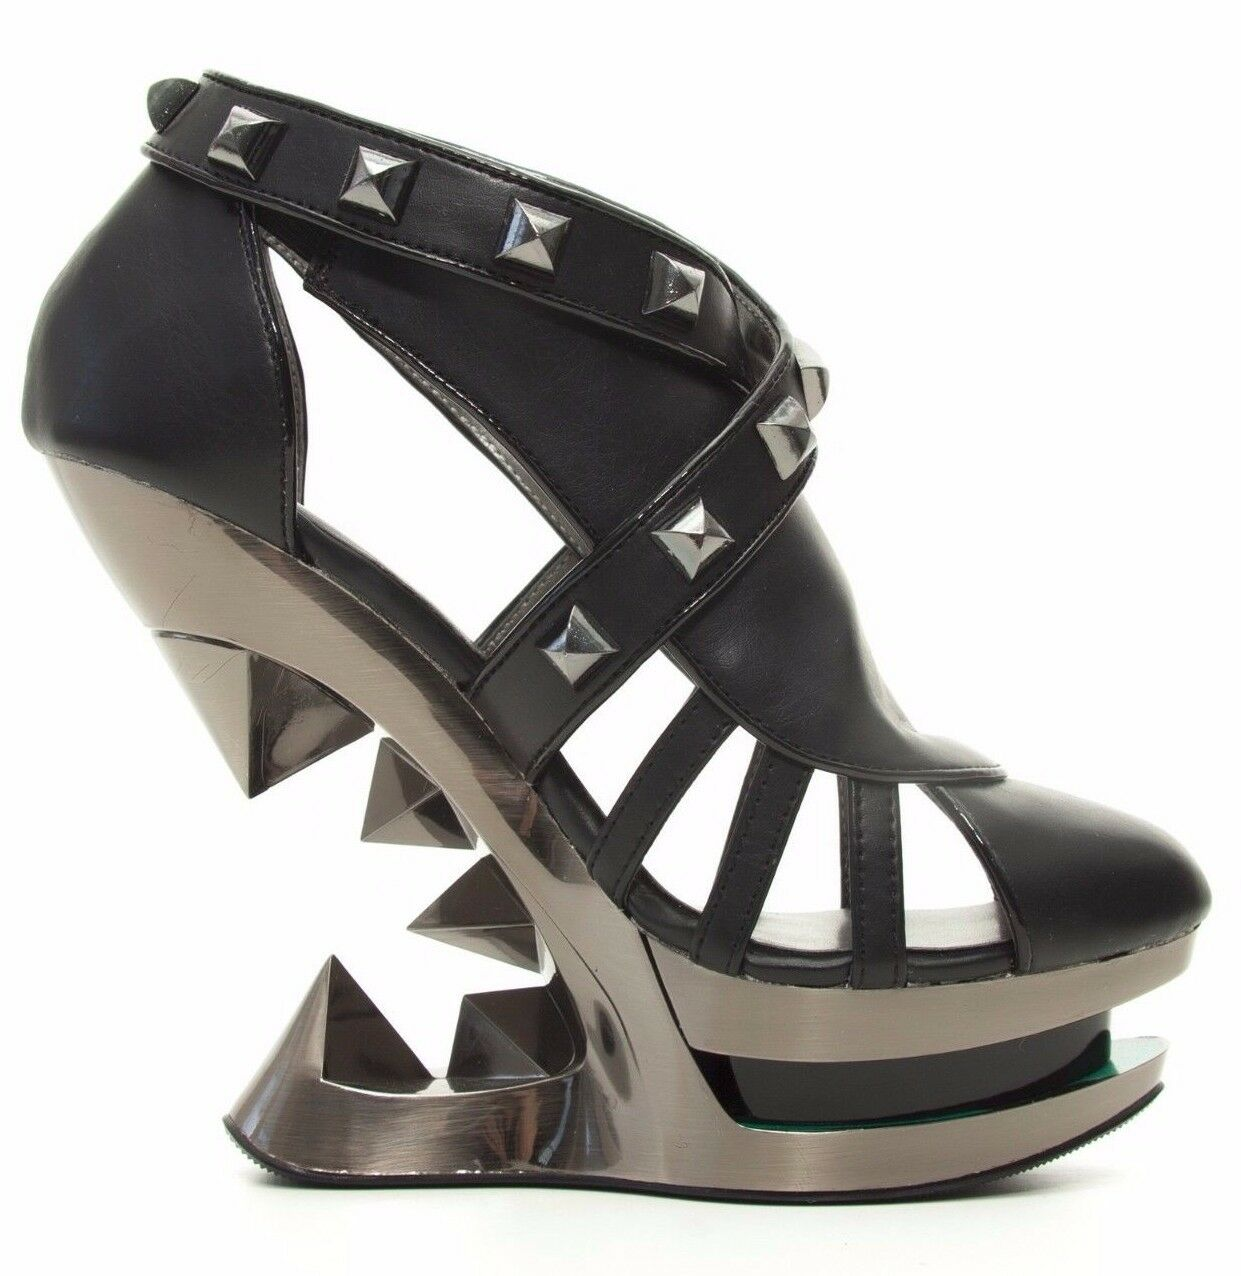 Sexy Hades KRACE Black Strappy Shoes Platform Gun Metal Wedge Iceberg Wedge Metal Heels 295d9a